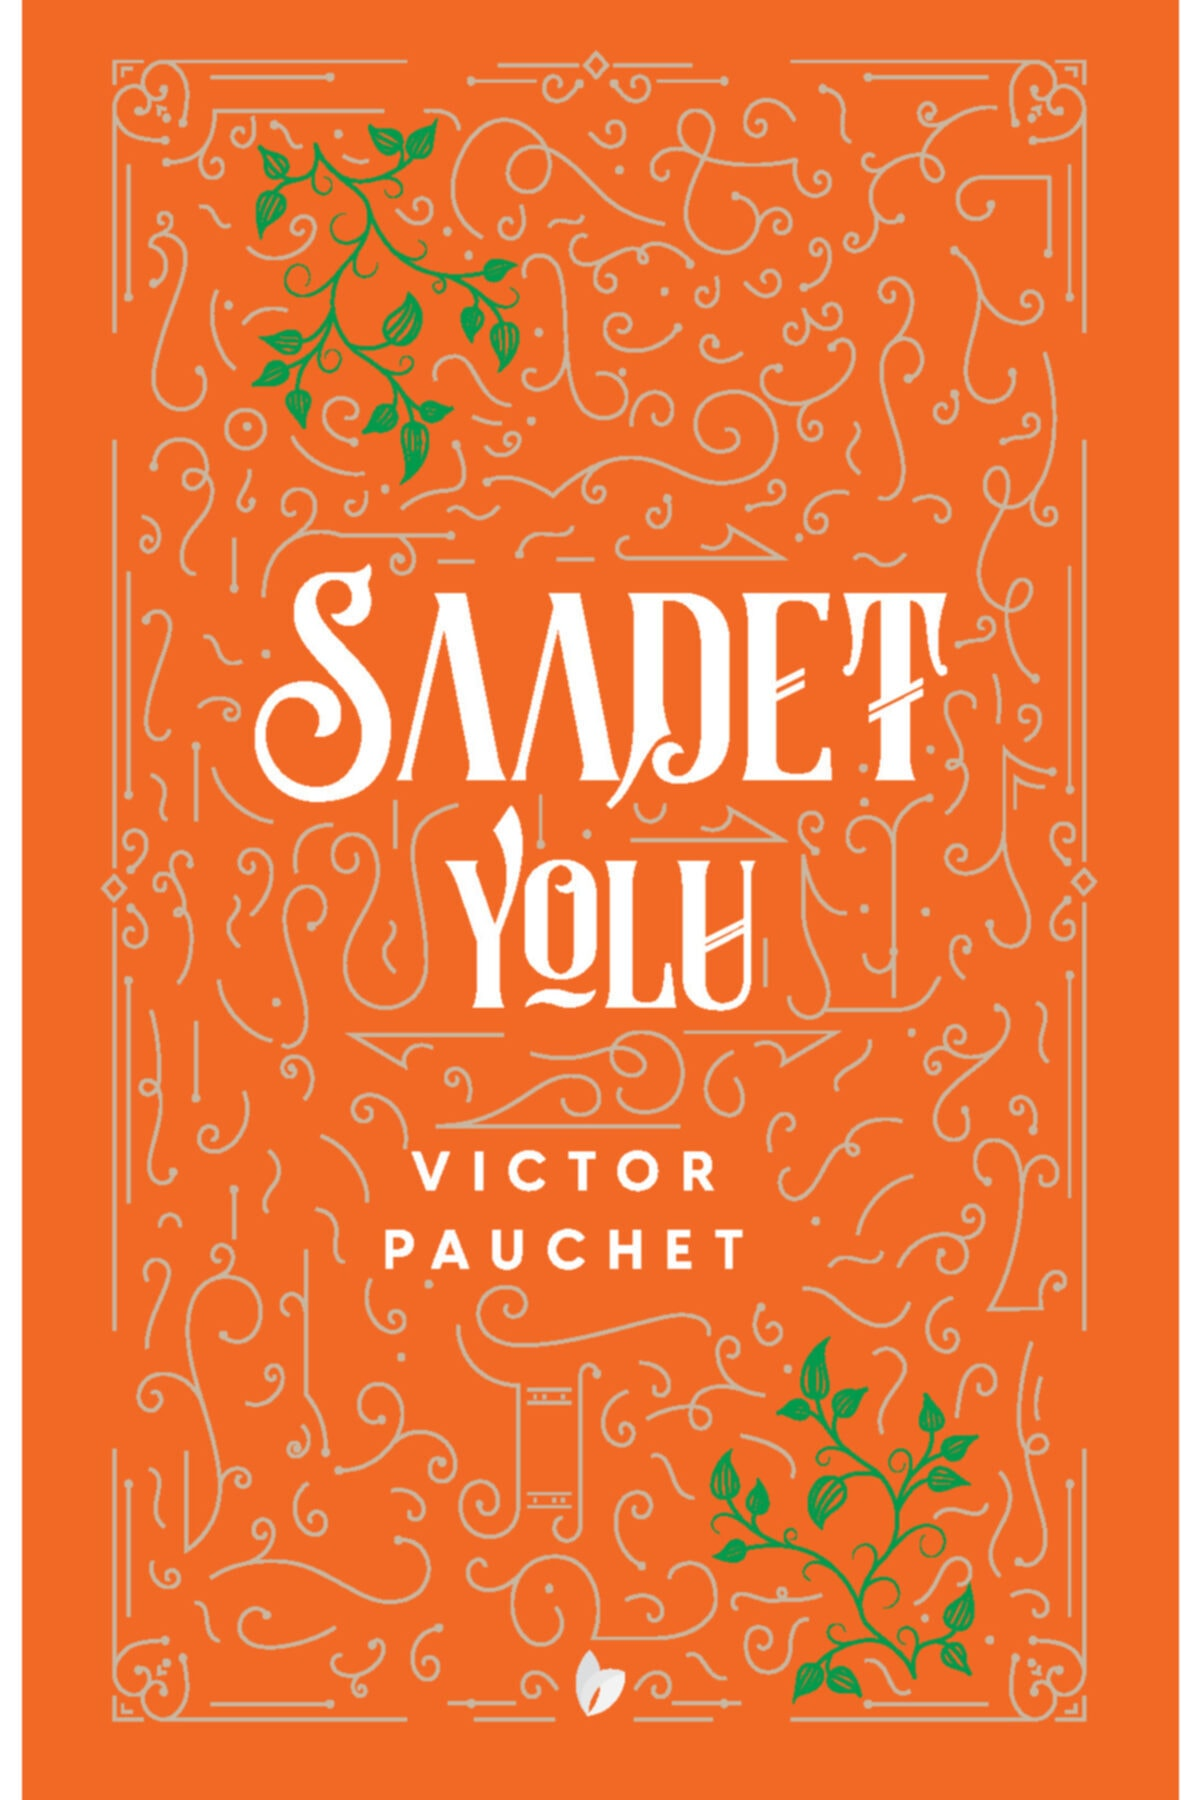 Buğday Kitap Saadet Yolu - Victor Pauchet 1